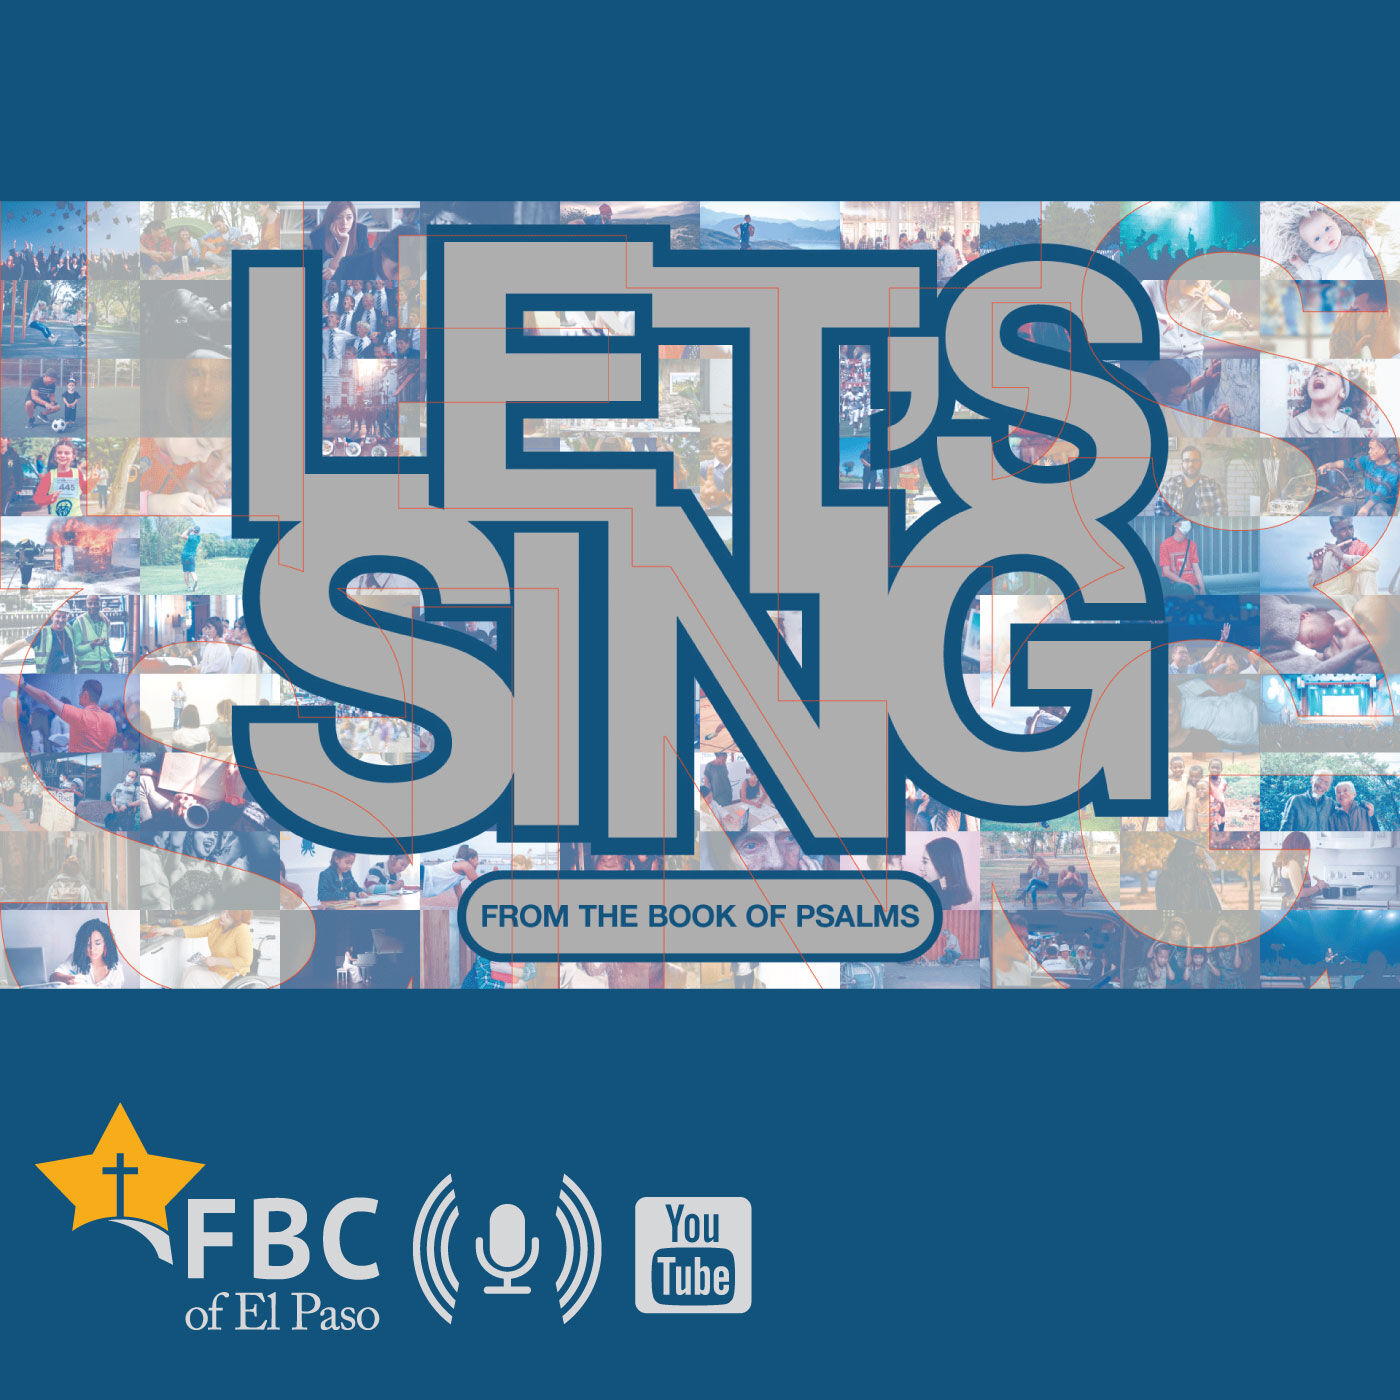 Let's Sing: School Supplies (August 16, 2020)